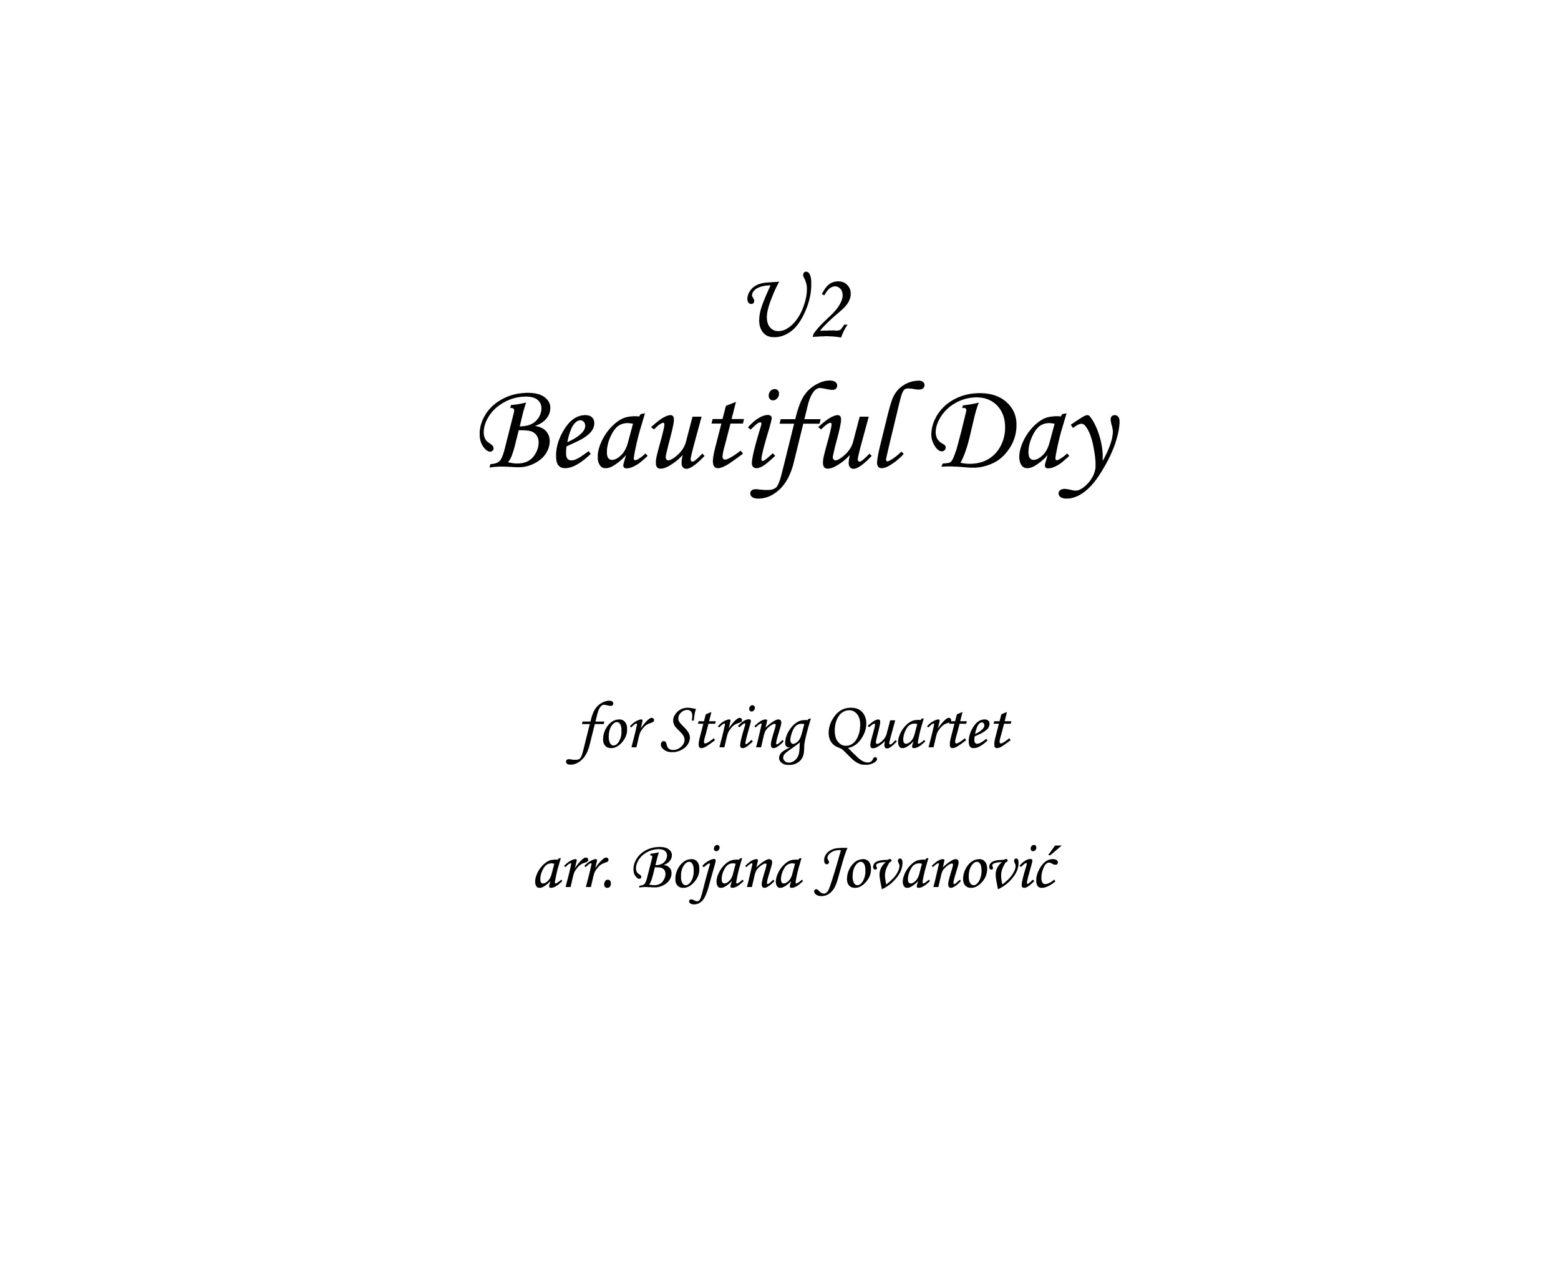 Beautiful day (U2)